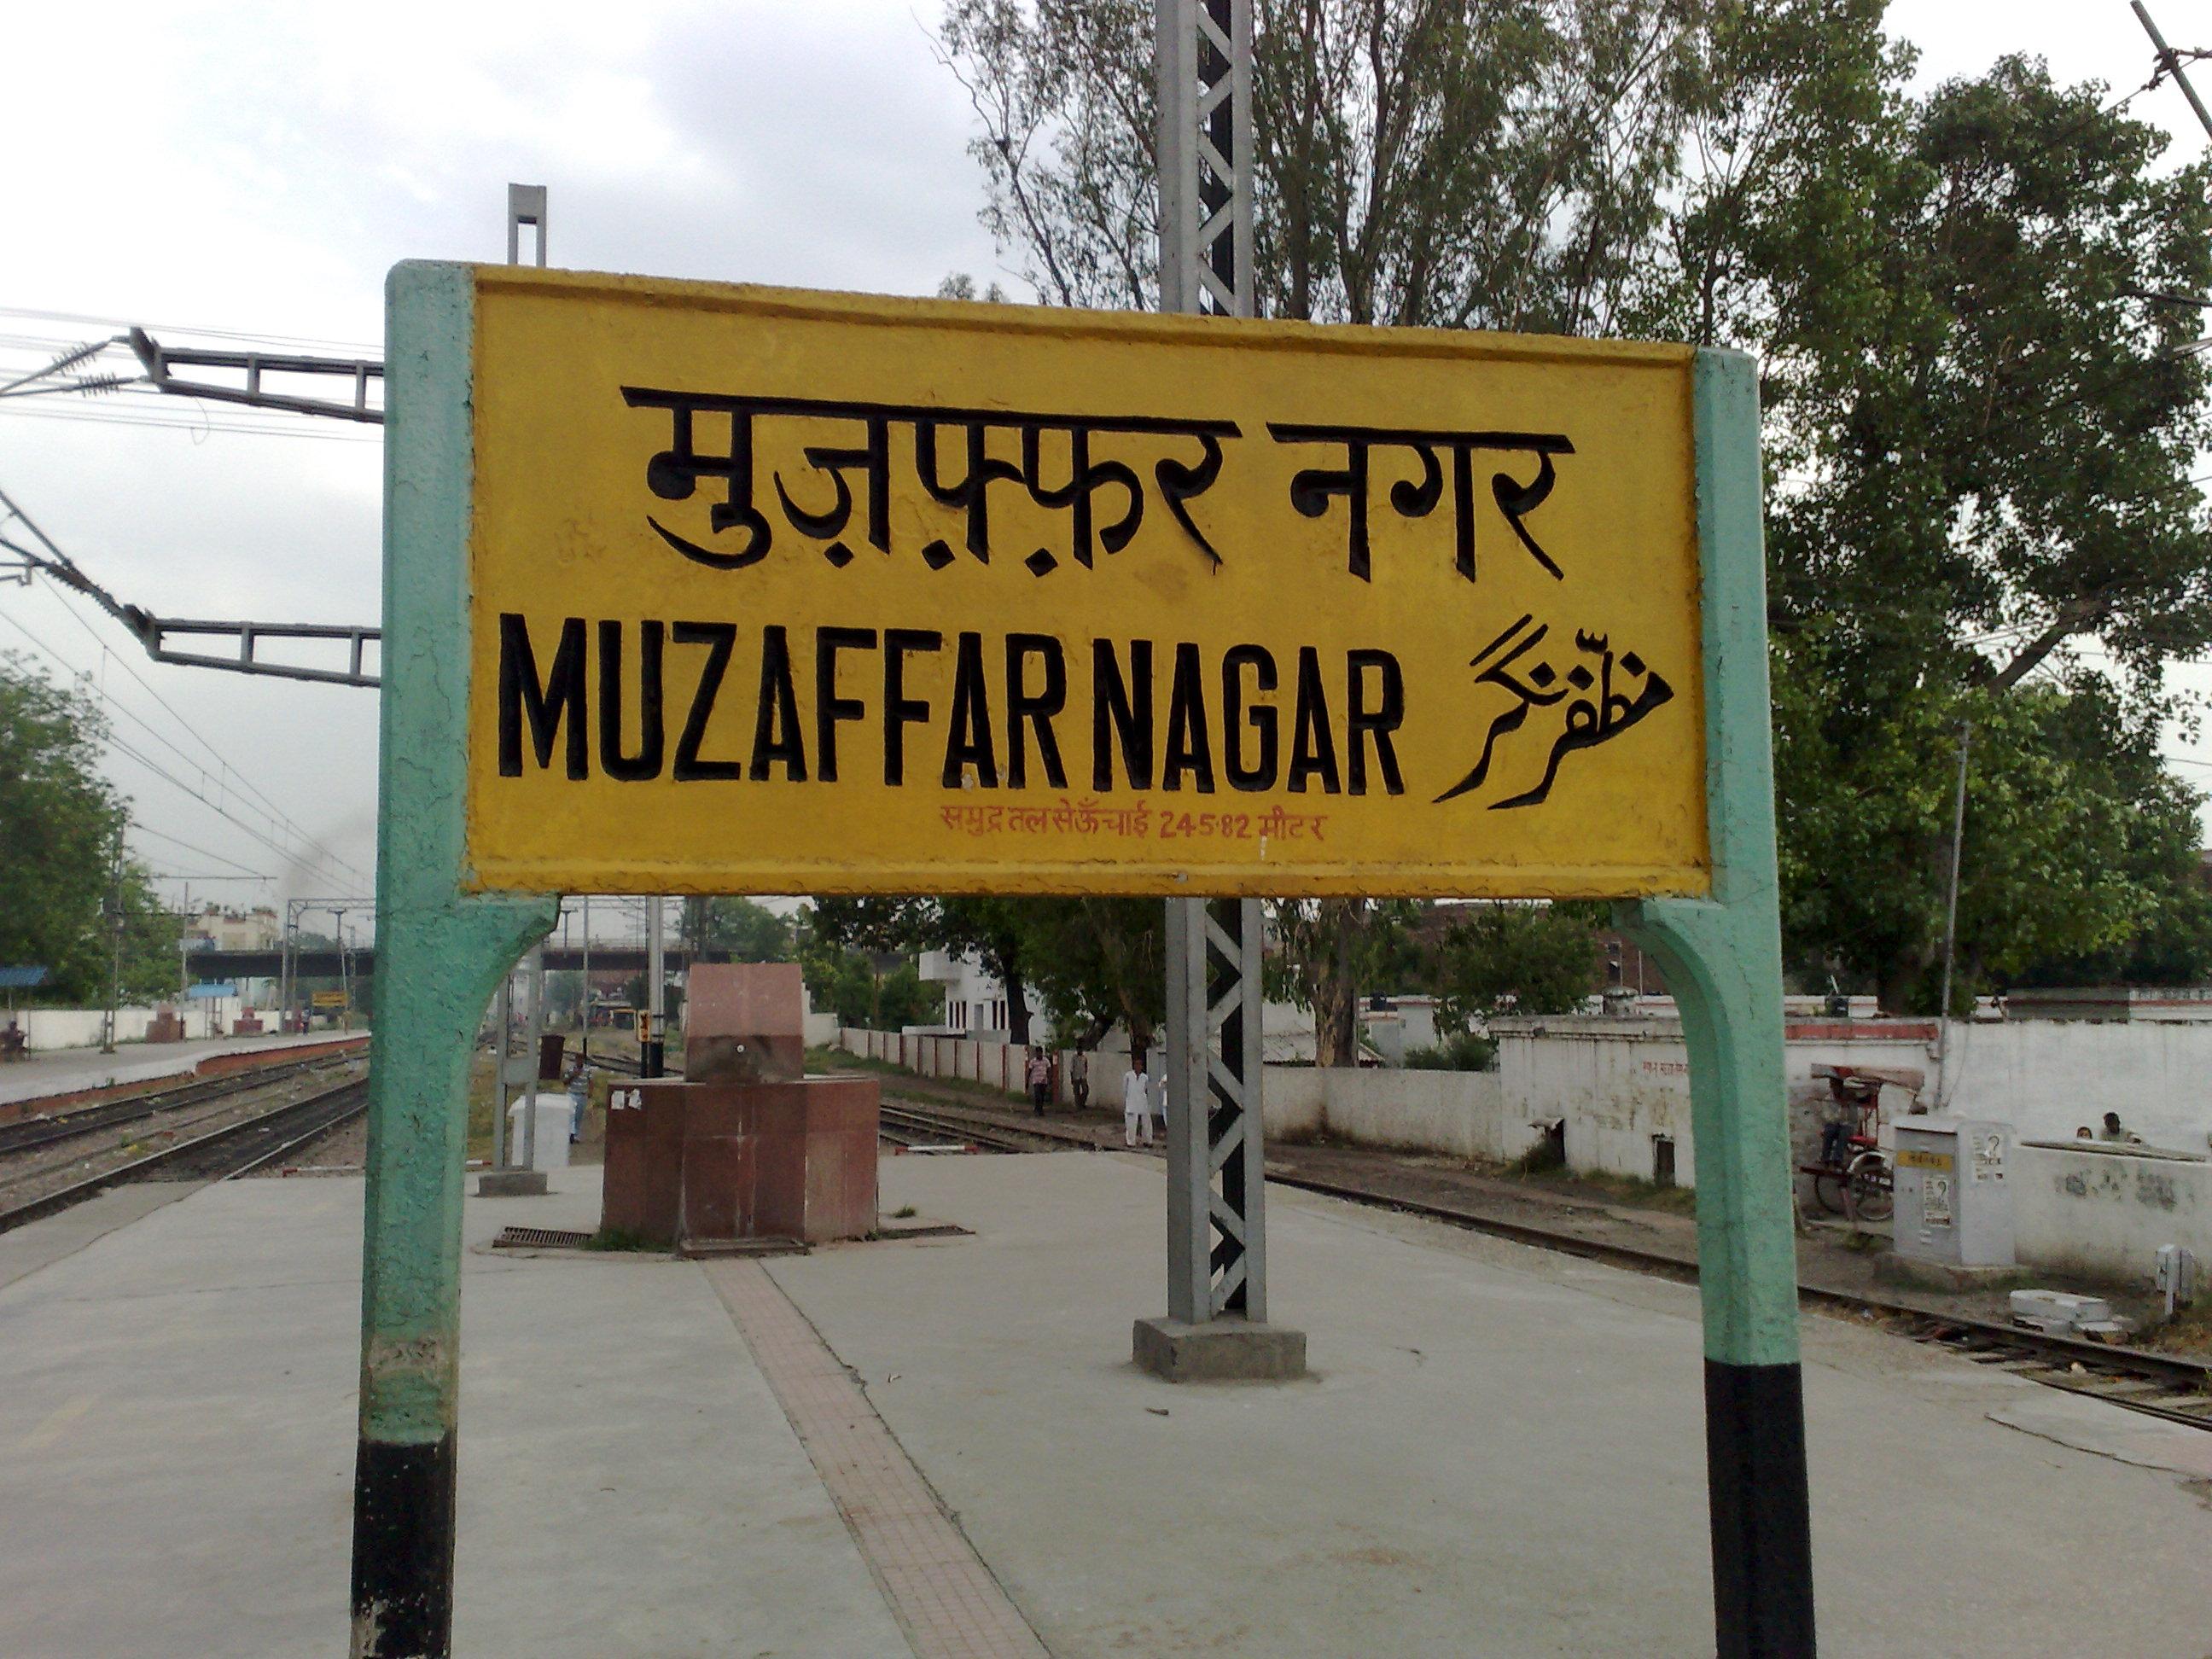 Muzaffarnagar Image